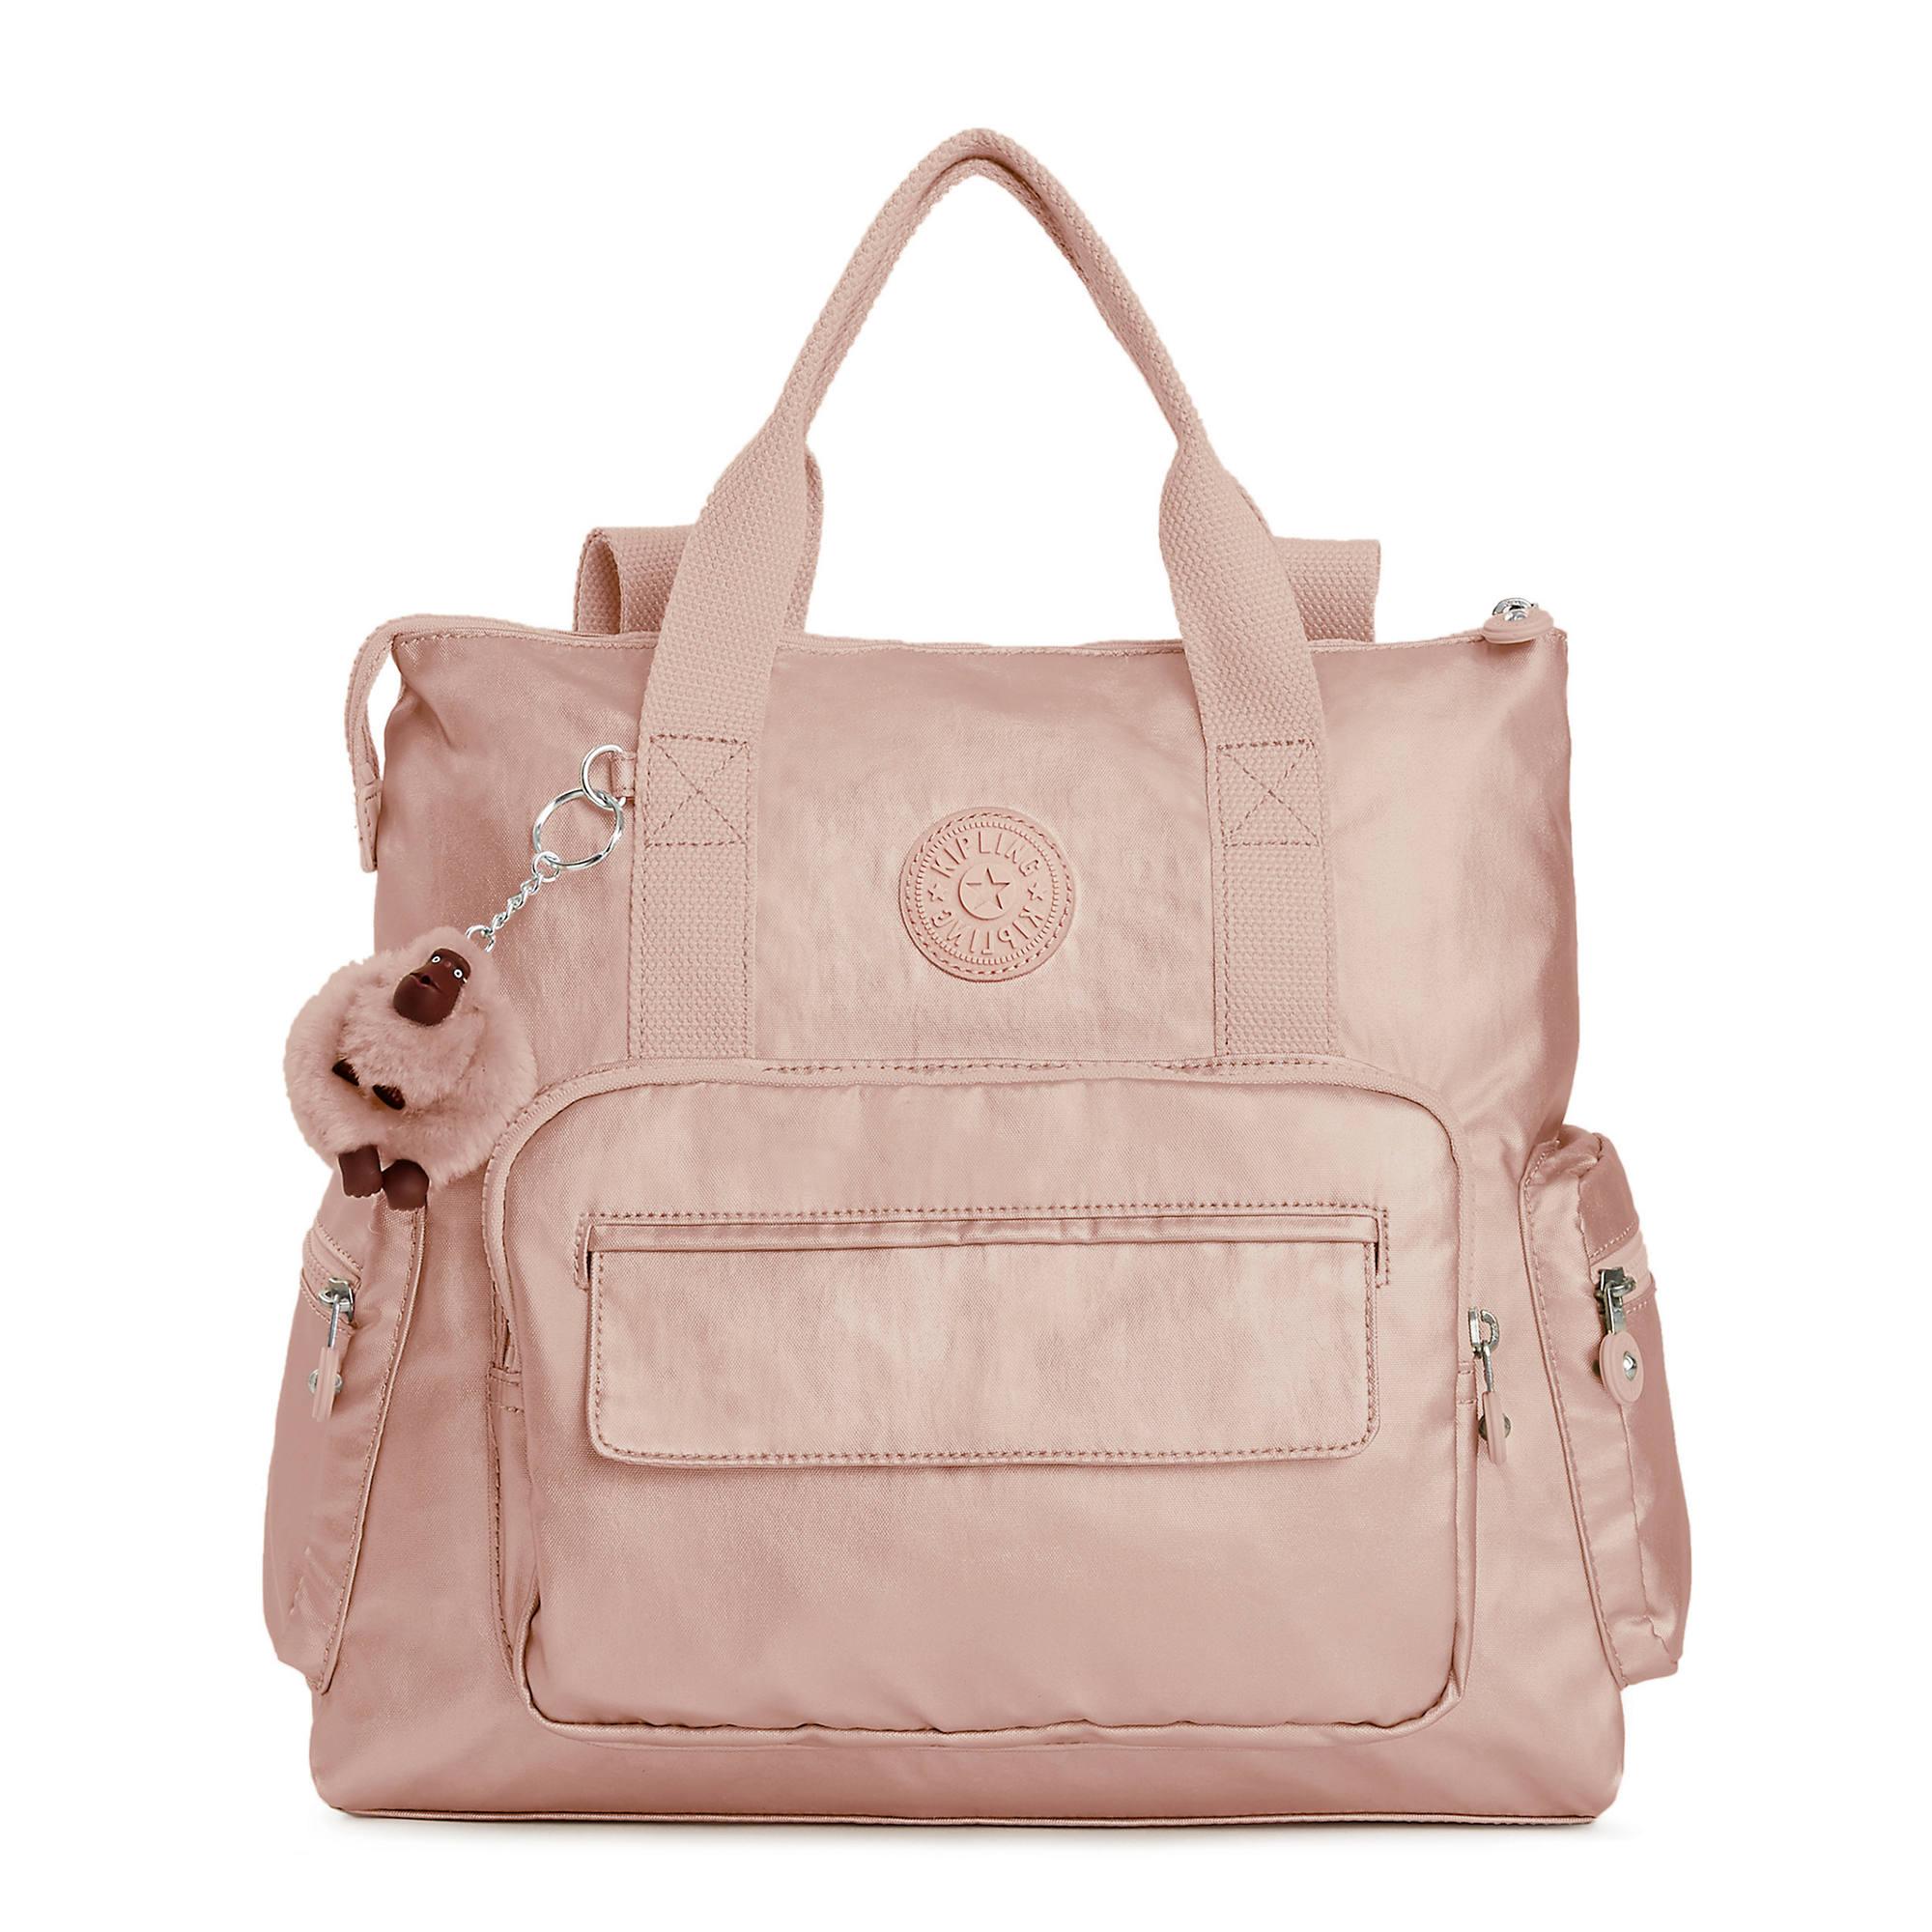 5e0d9da65 Alvy 2-in-1 Convertible Metallic Tote Bag Backpack,Rose Gold Metallic,